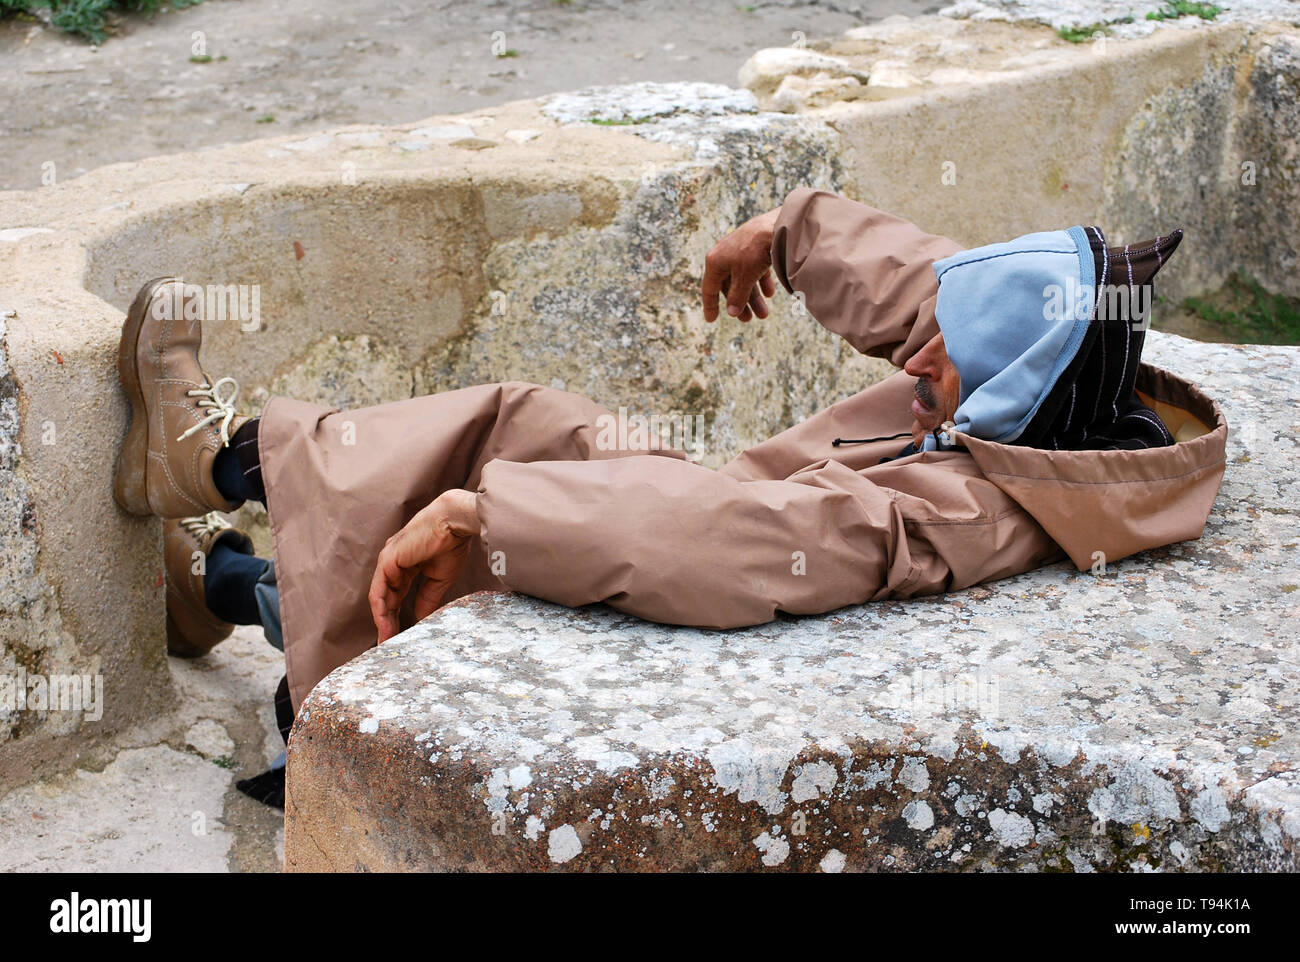 Portrait of a moroccan man, Meknès, Morocco - Stock Image